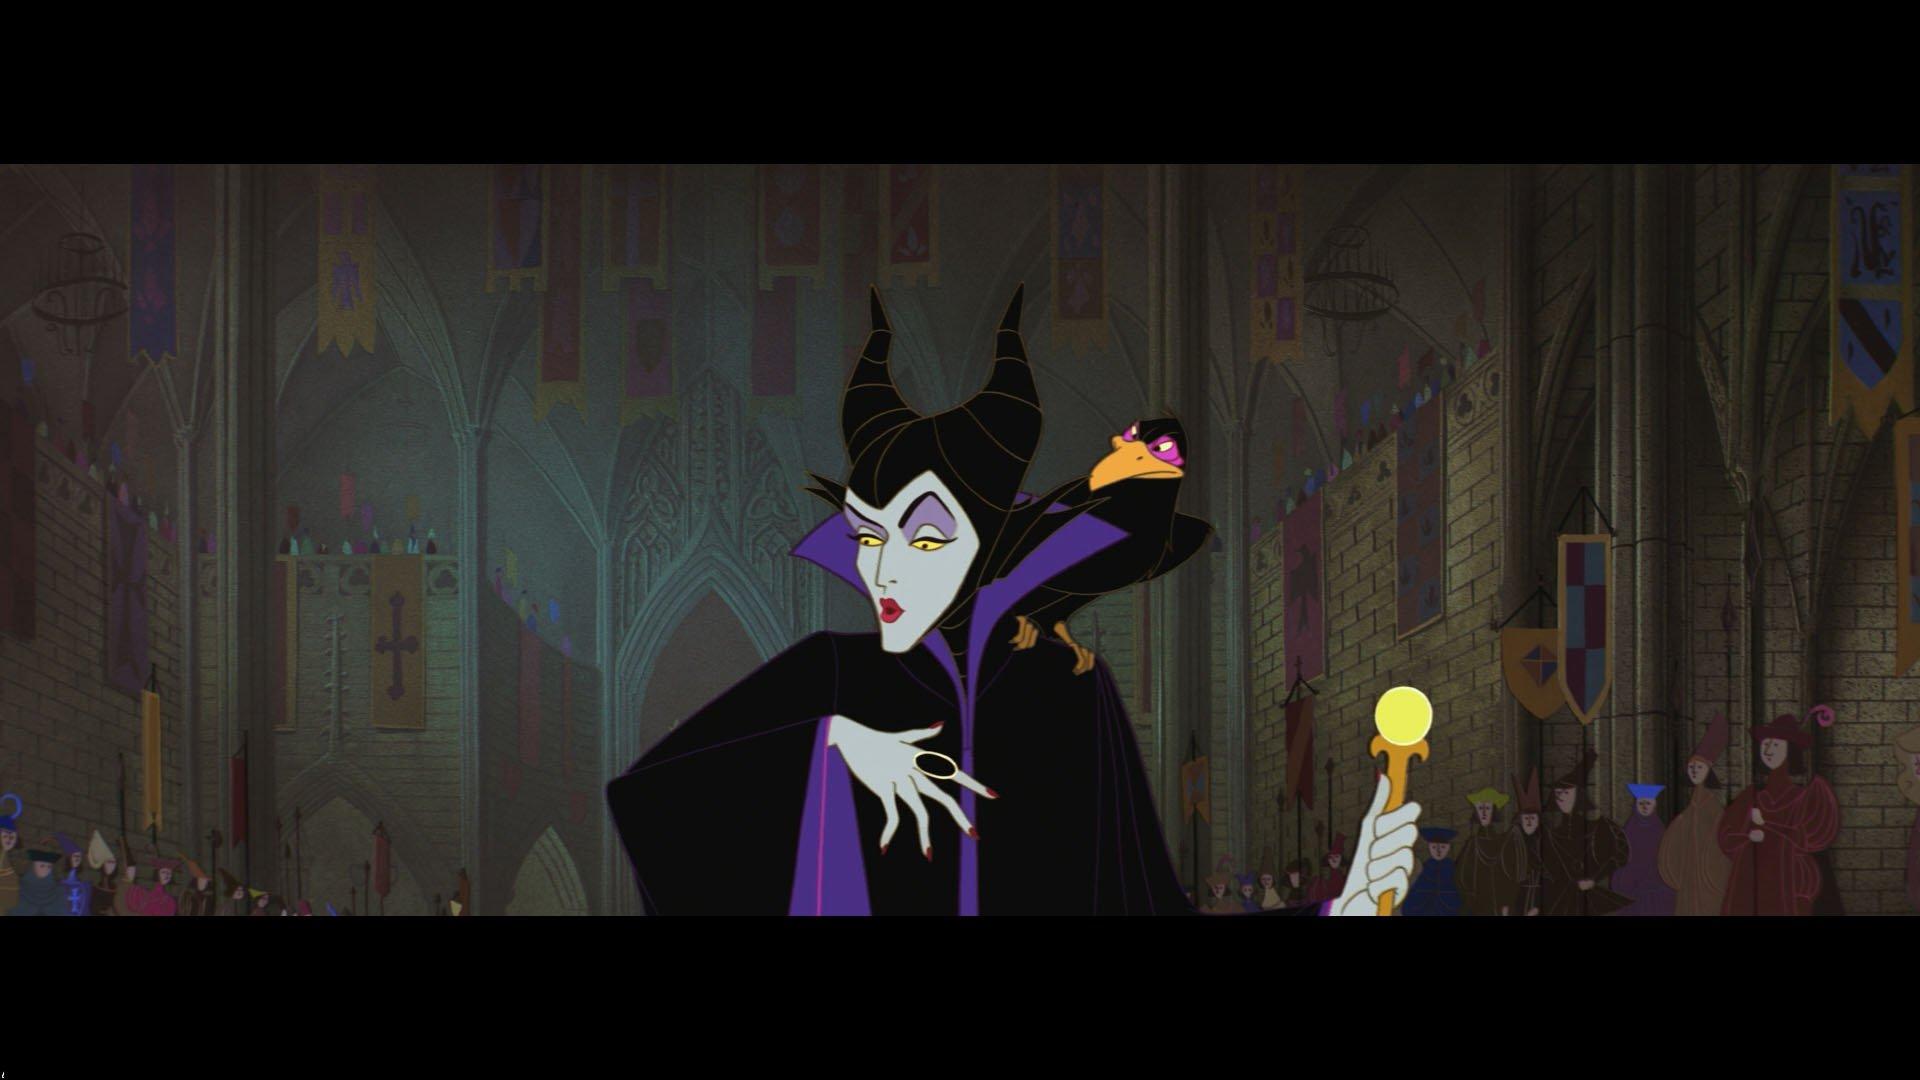 Disney Company Sleeping Beauty Maleficent Wallpaper 1920x1080 255178 Wallpaperup